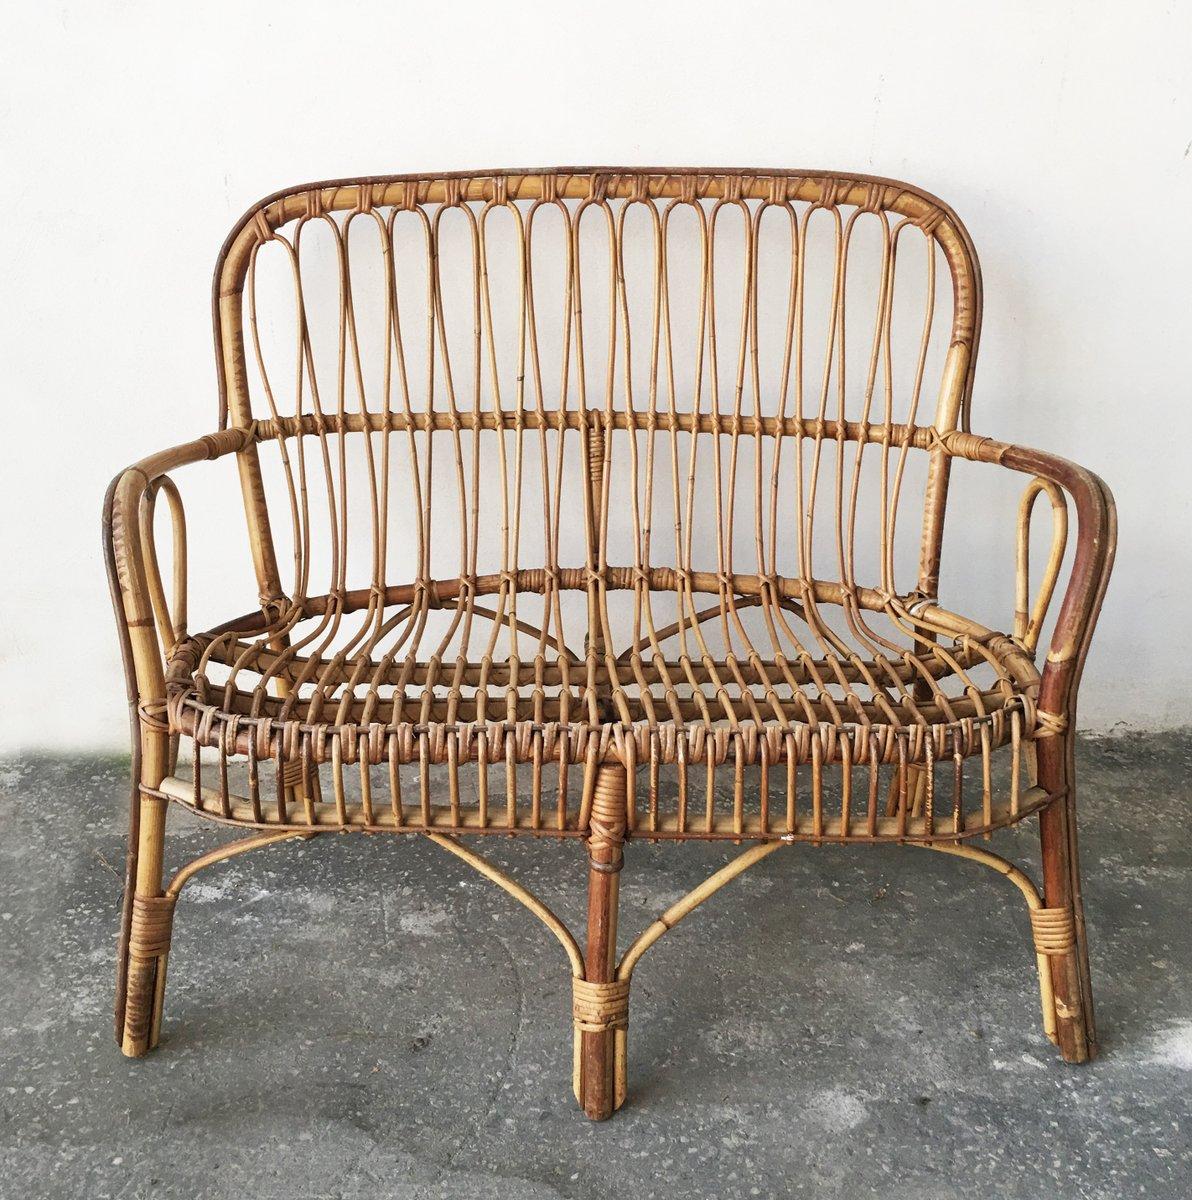 2-Sitzer Bank aus Bambus & Rattan, 1950er